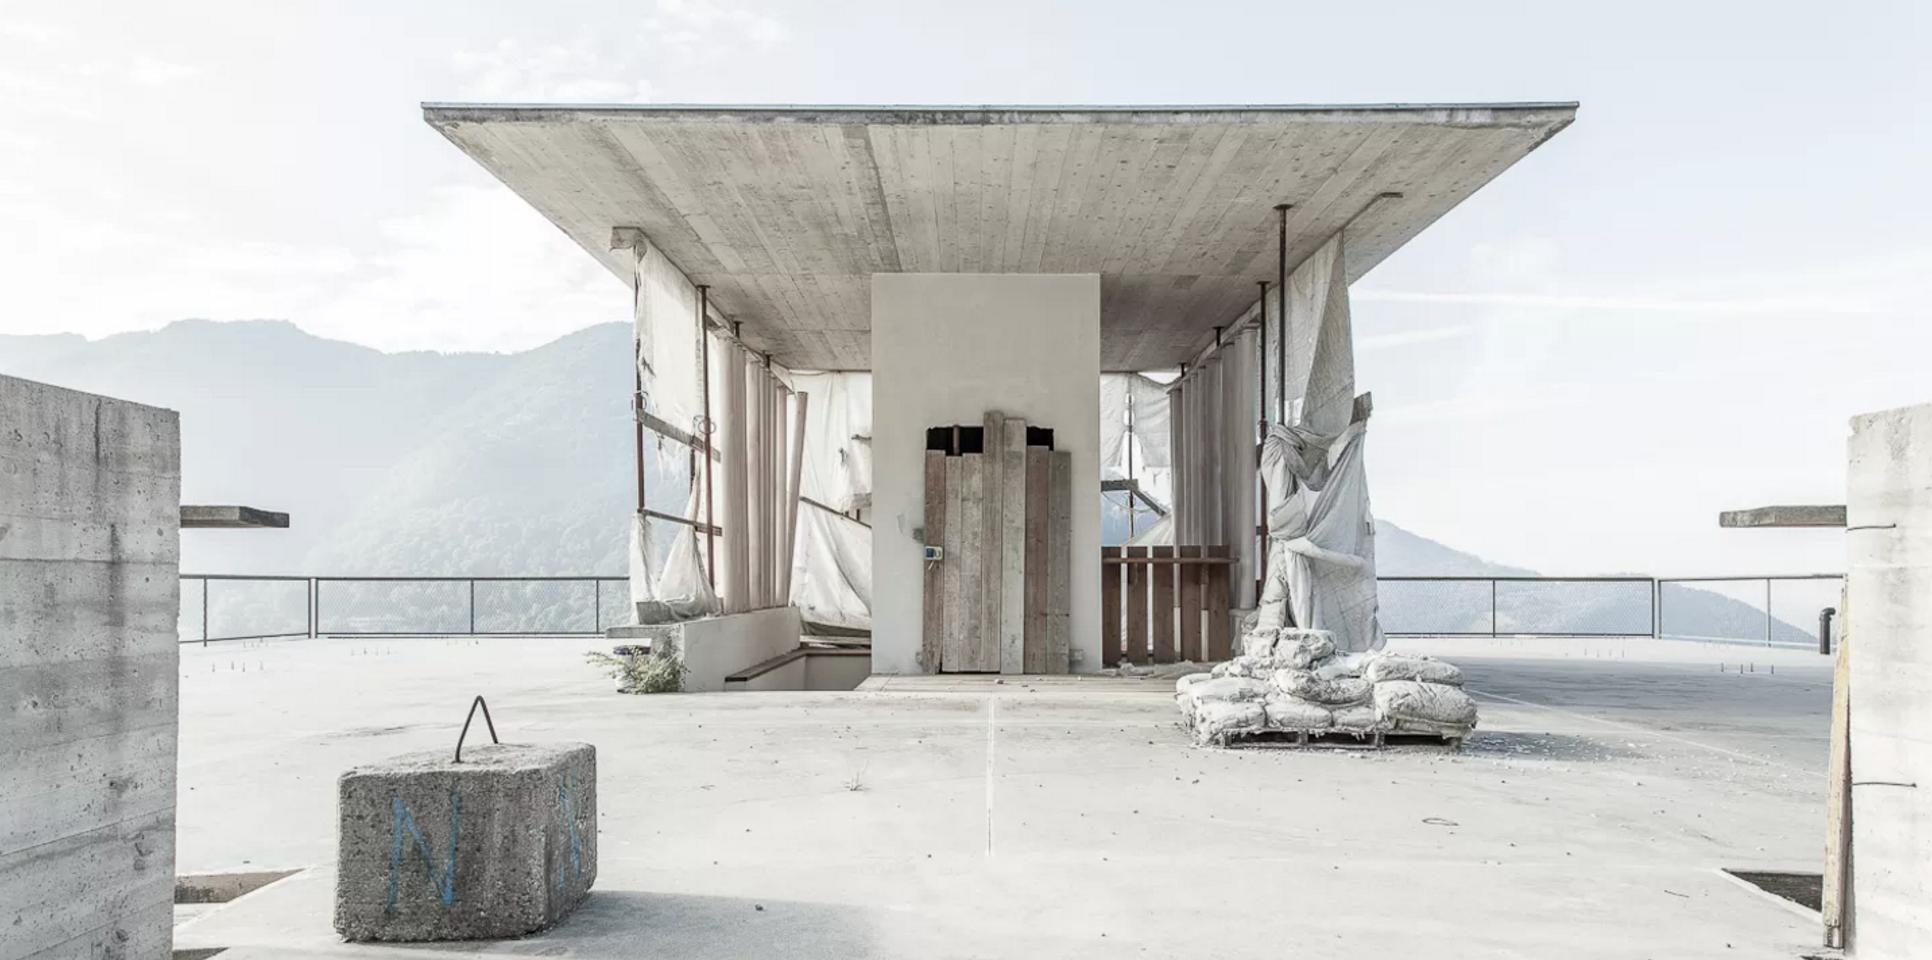 #Architecture in #Italy - #WIP by Bruno Vaerini, ph Luca Santiago Mora